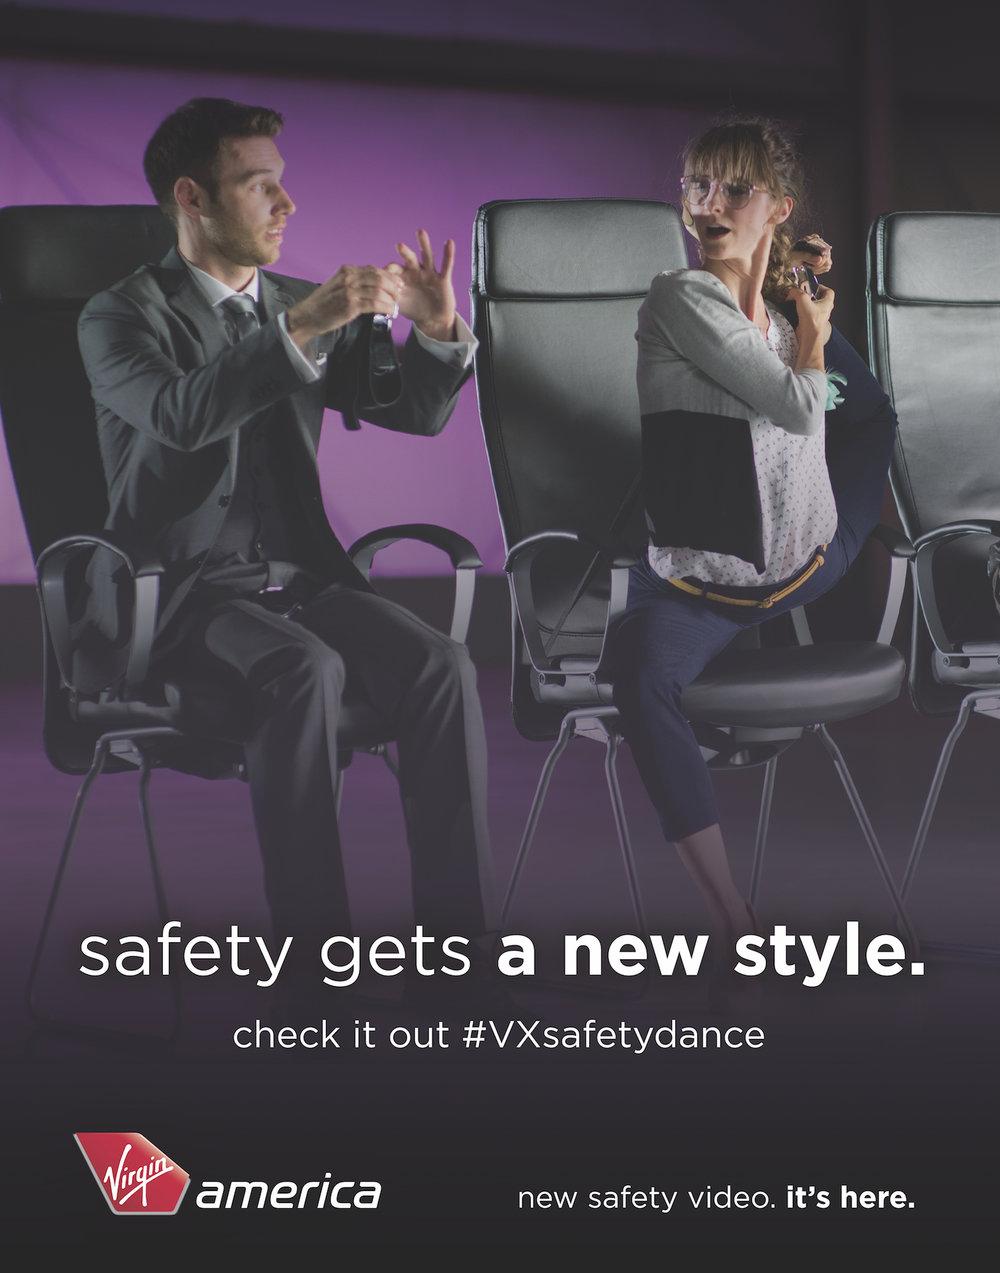 SafetyVideio_Signage_newStyle2.jpg